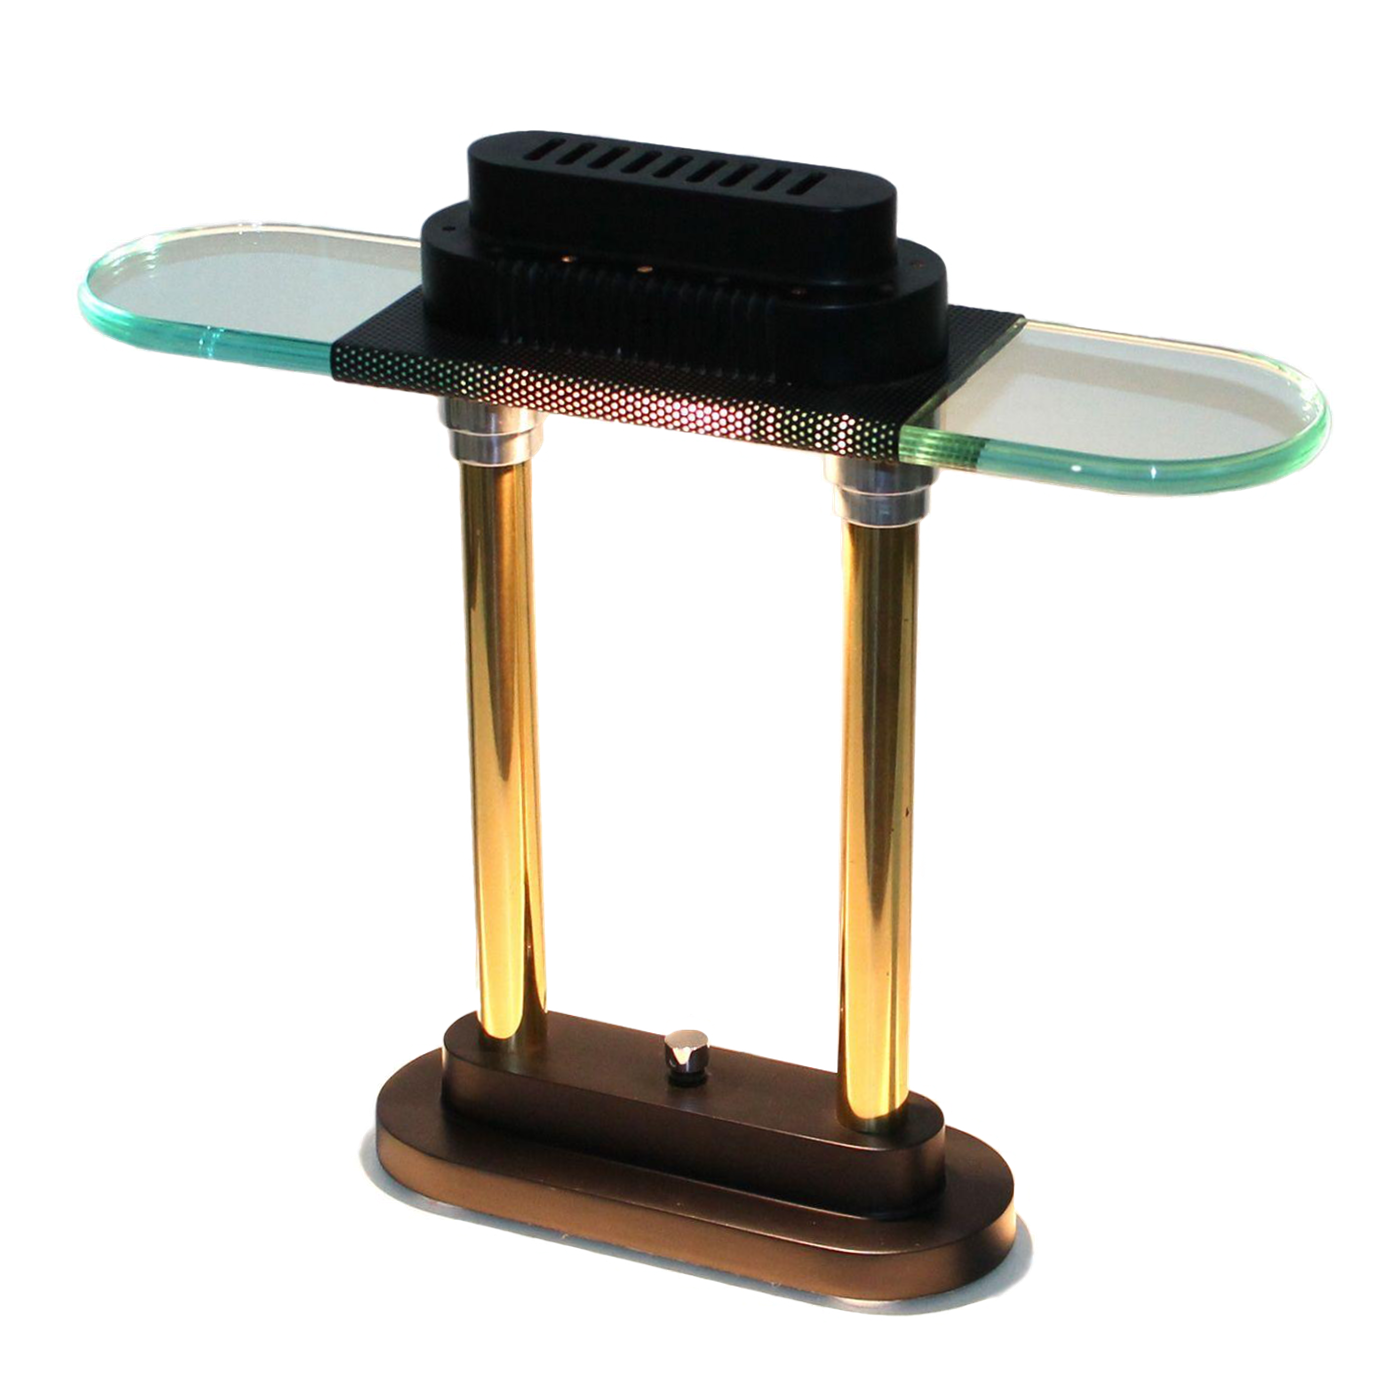 Sonneman post modern bankers desk lamp chairish aloadofball Images